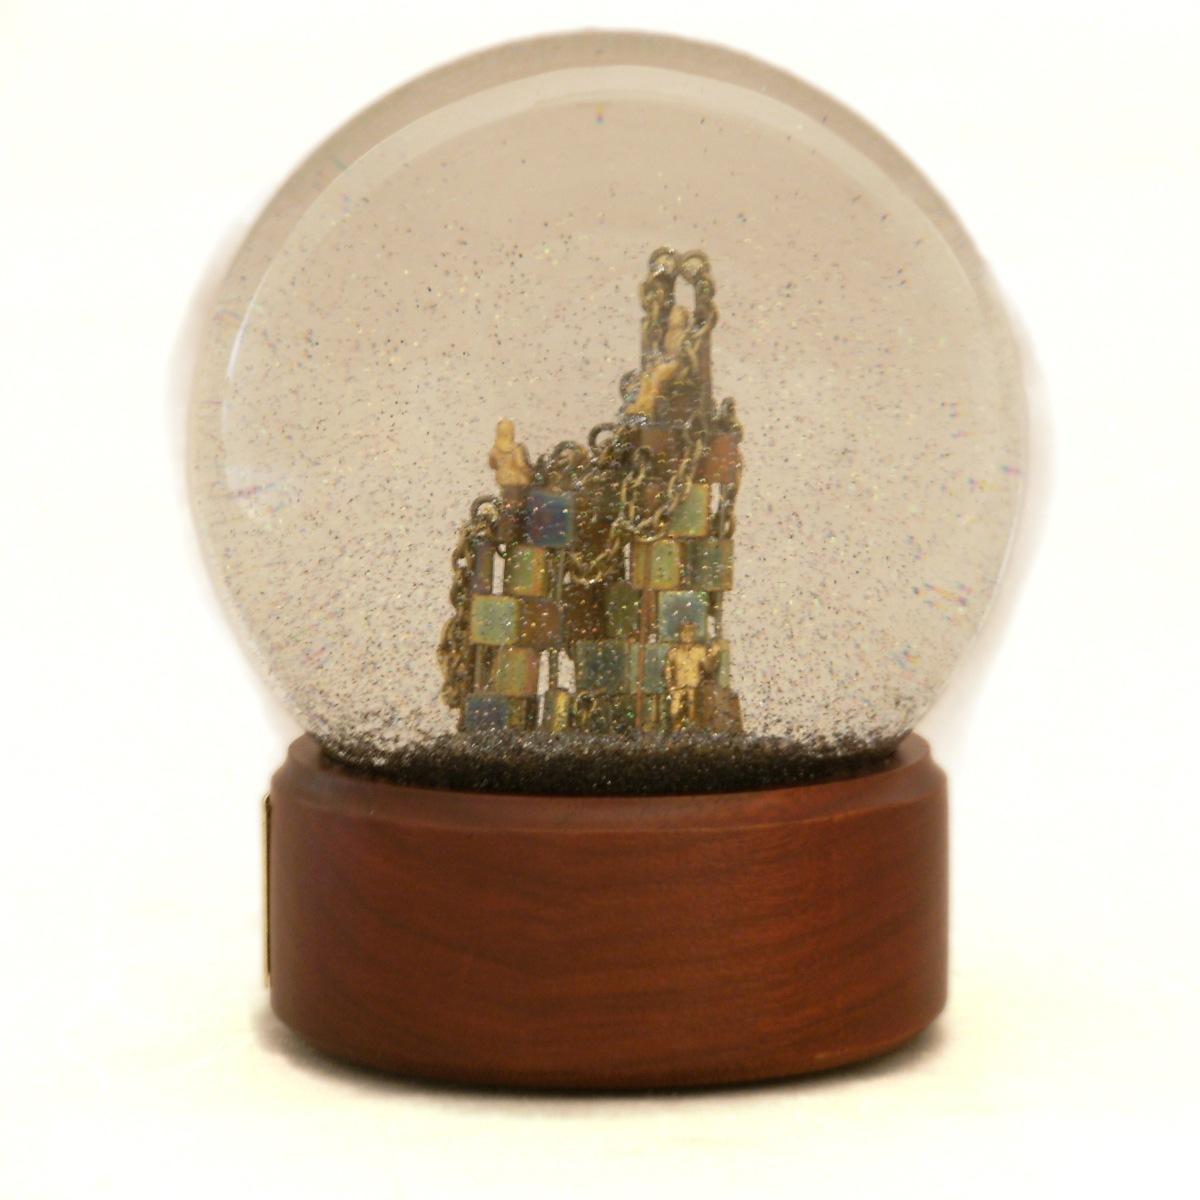 Waiting for Instructions custom snow globe, Camryn Forrest Designs 2013